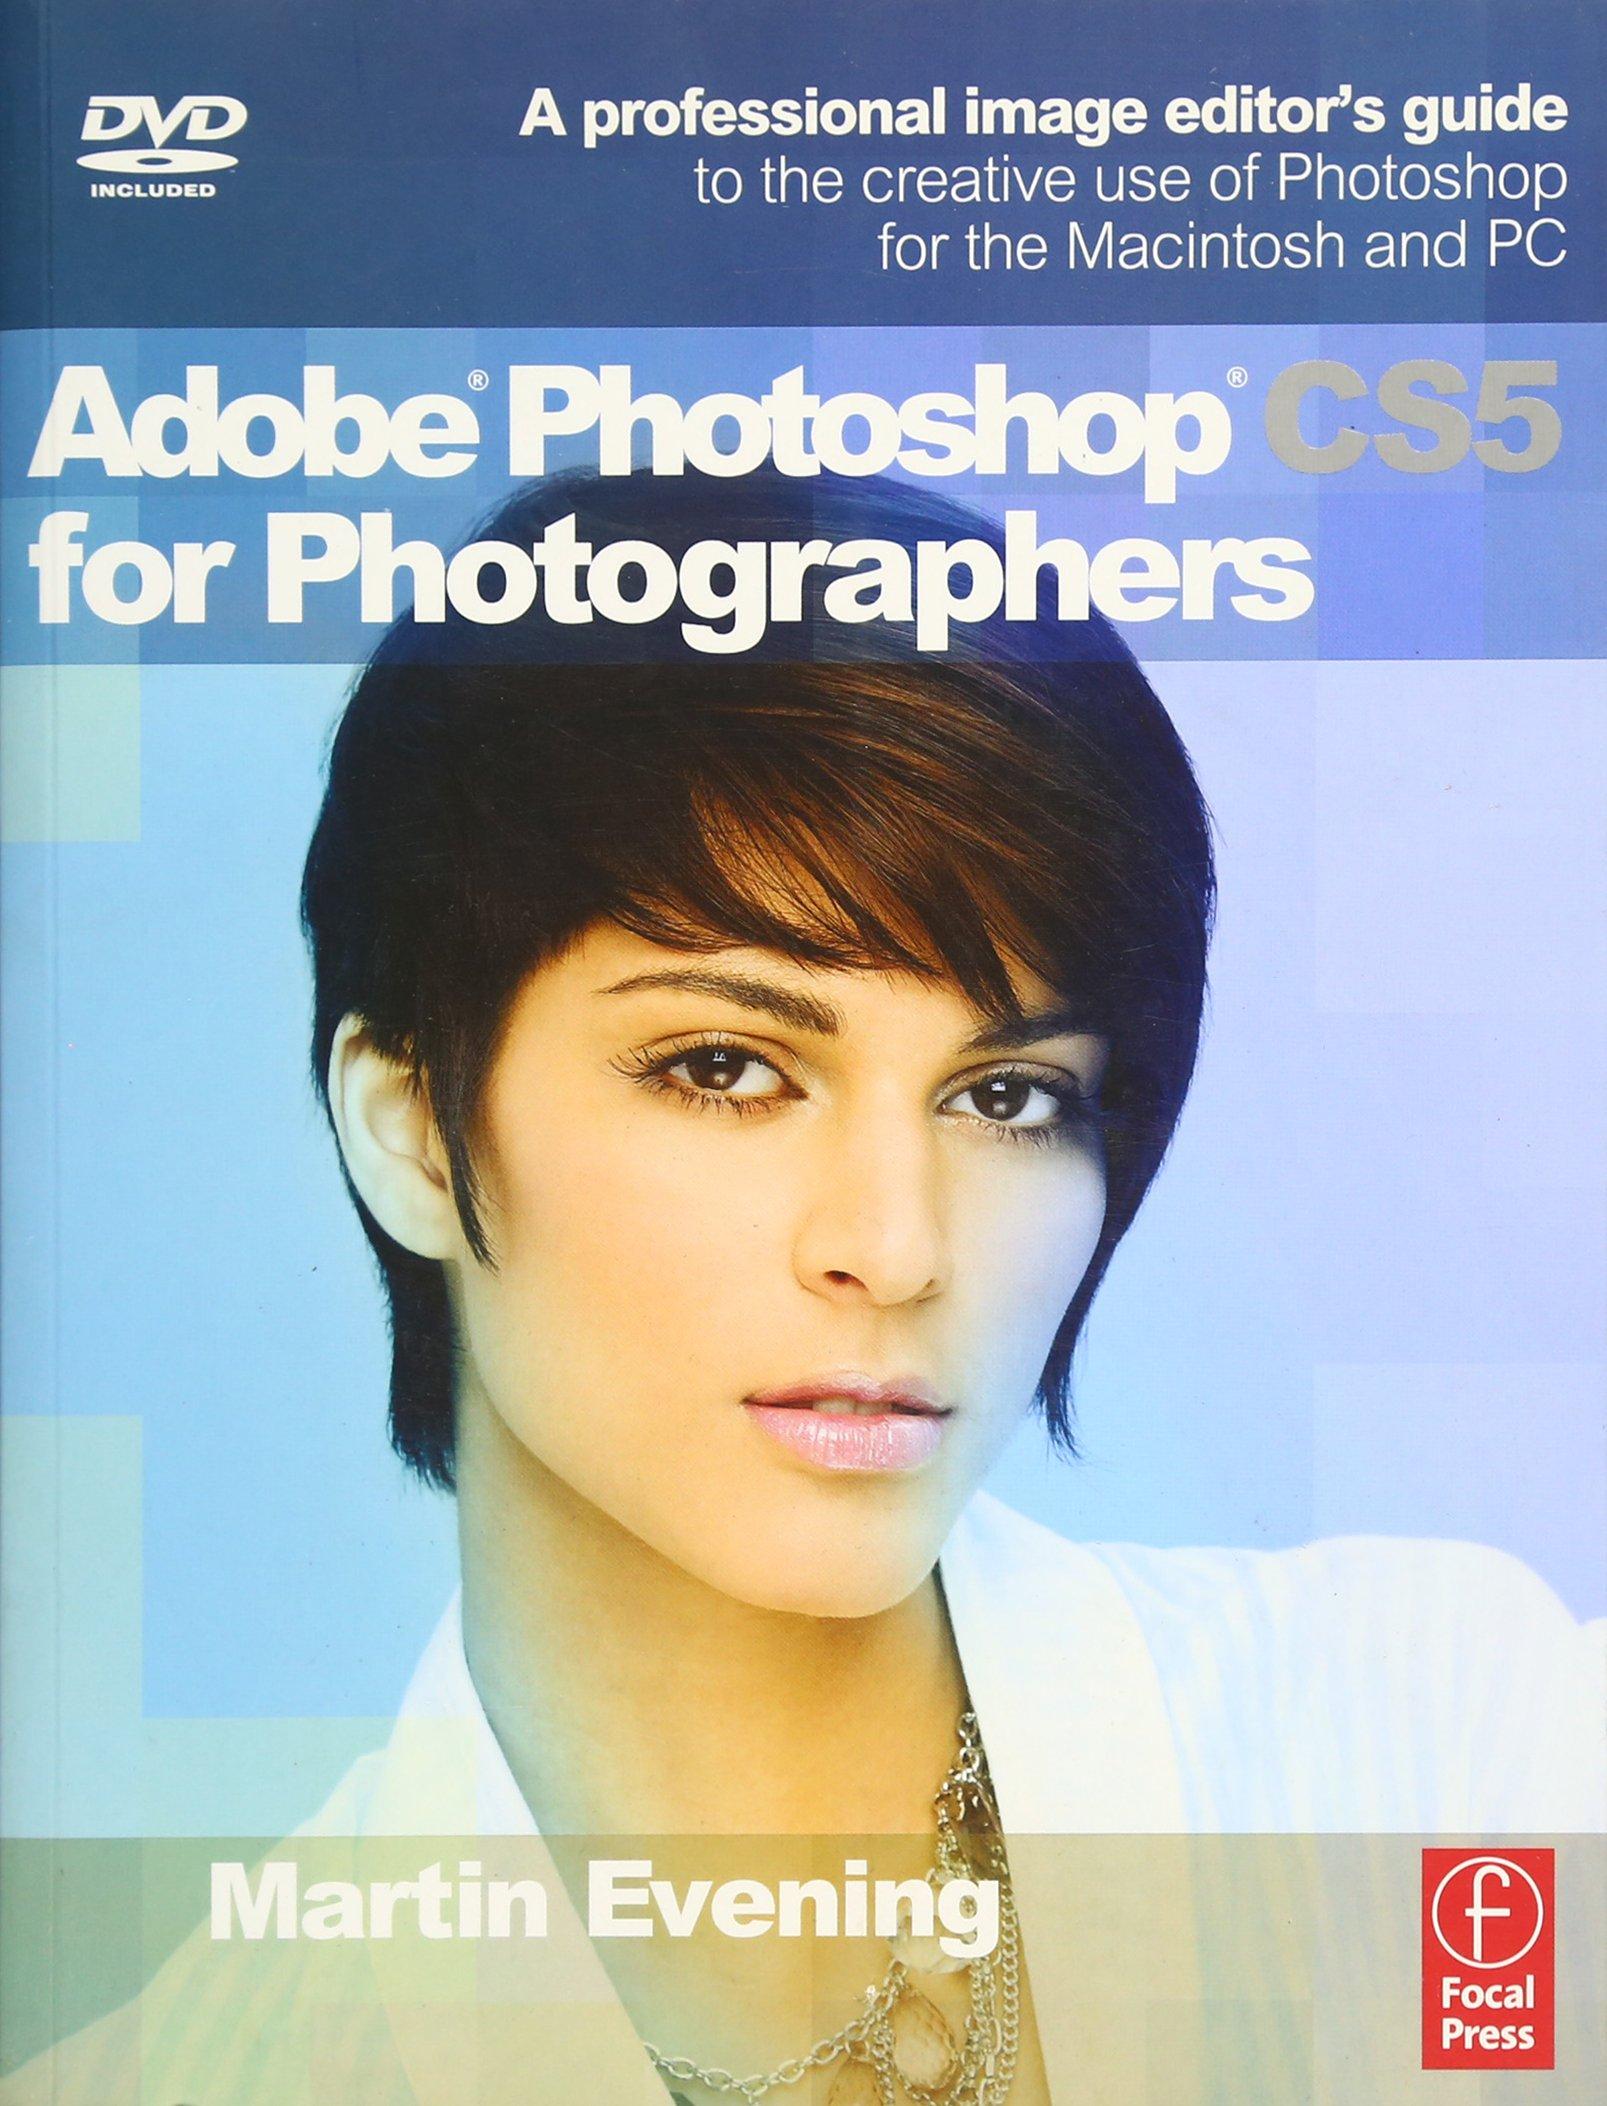 Best deals on Lynda.com - Photoshop CS5 for Photographers